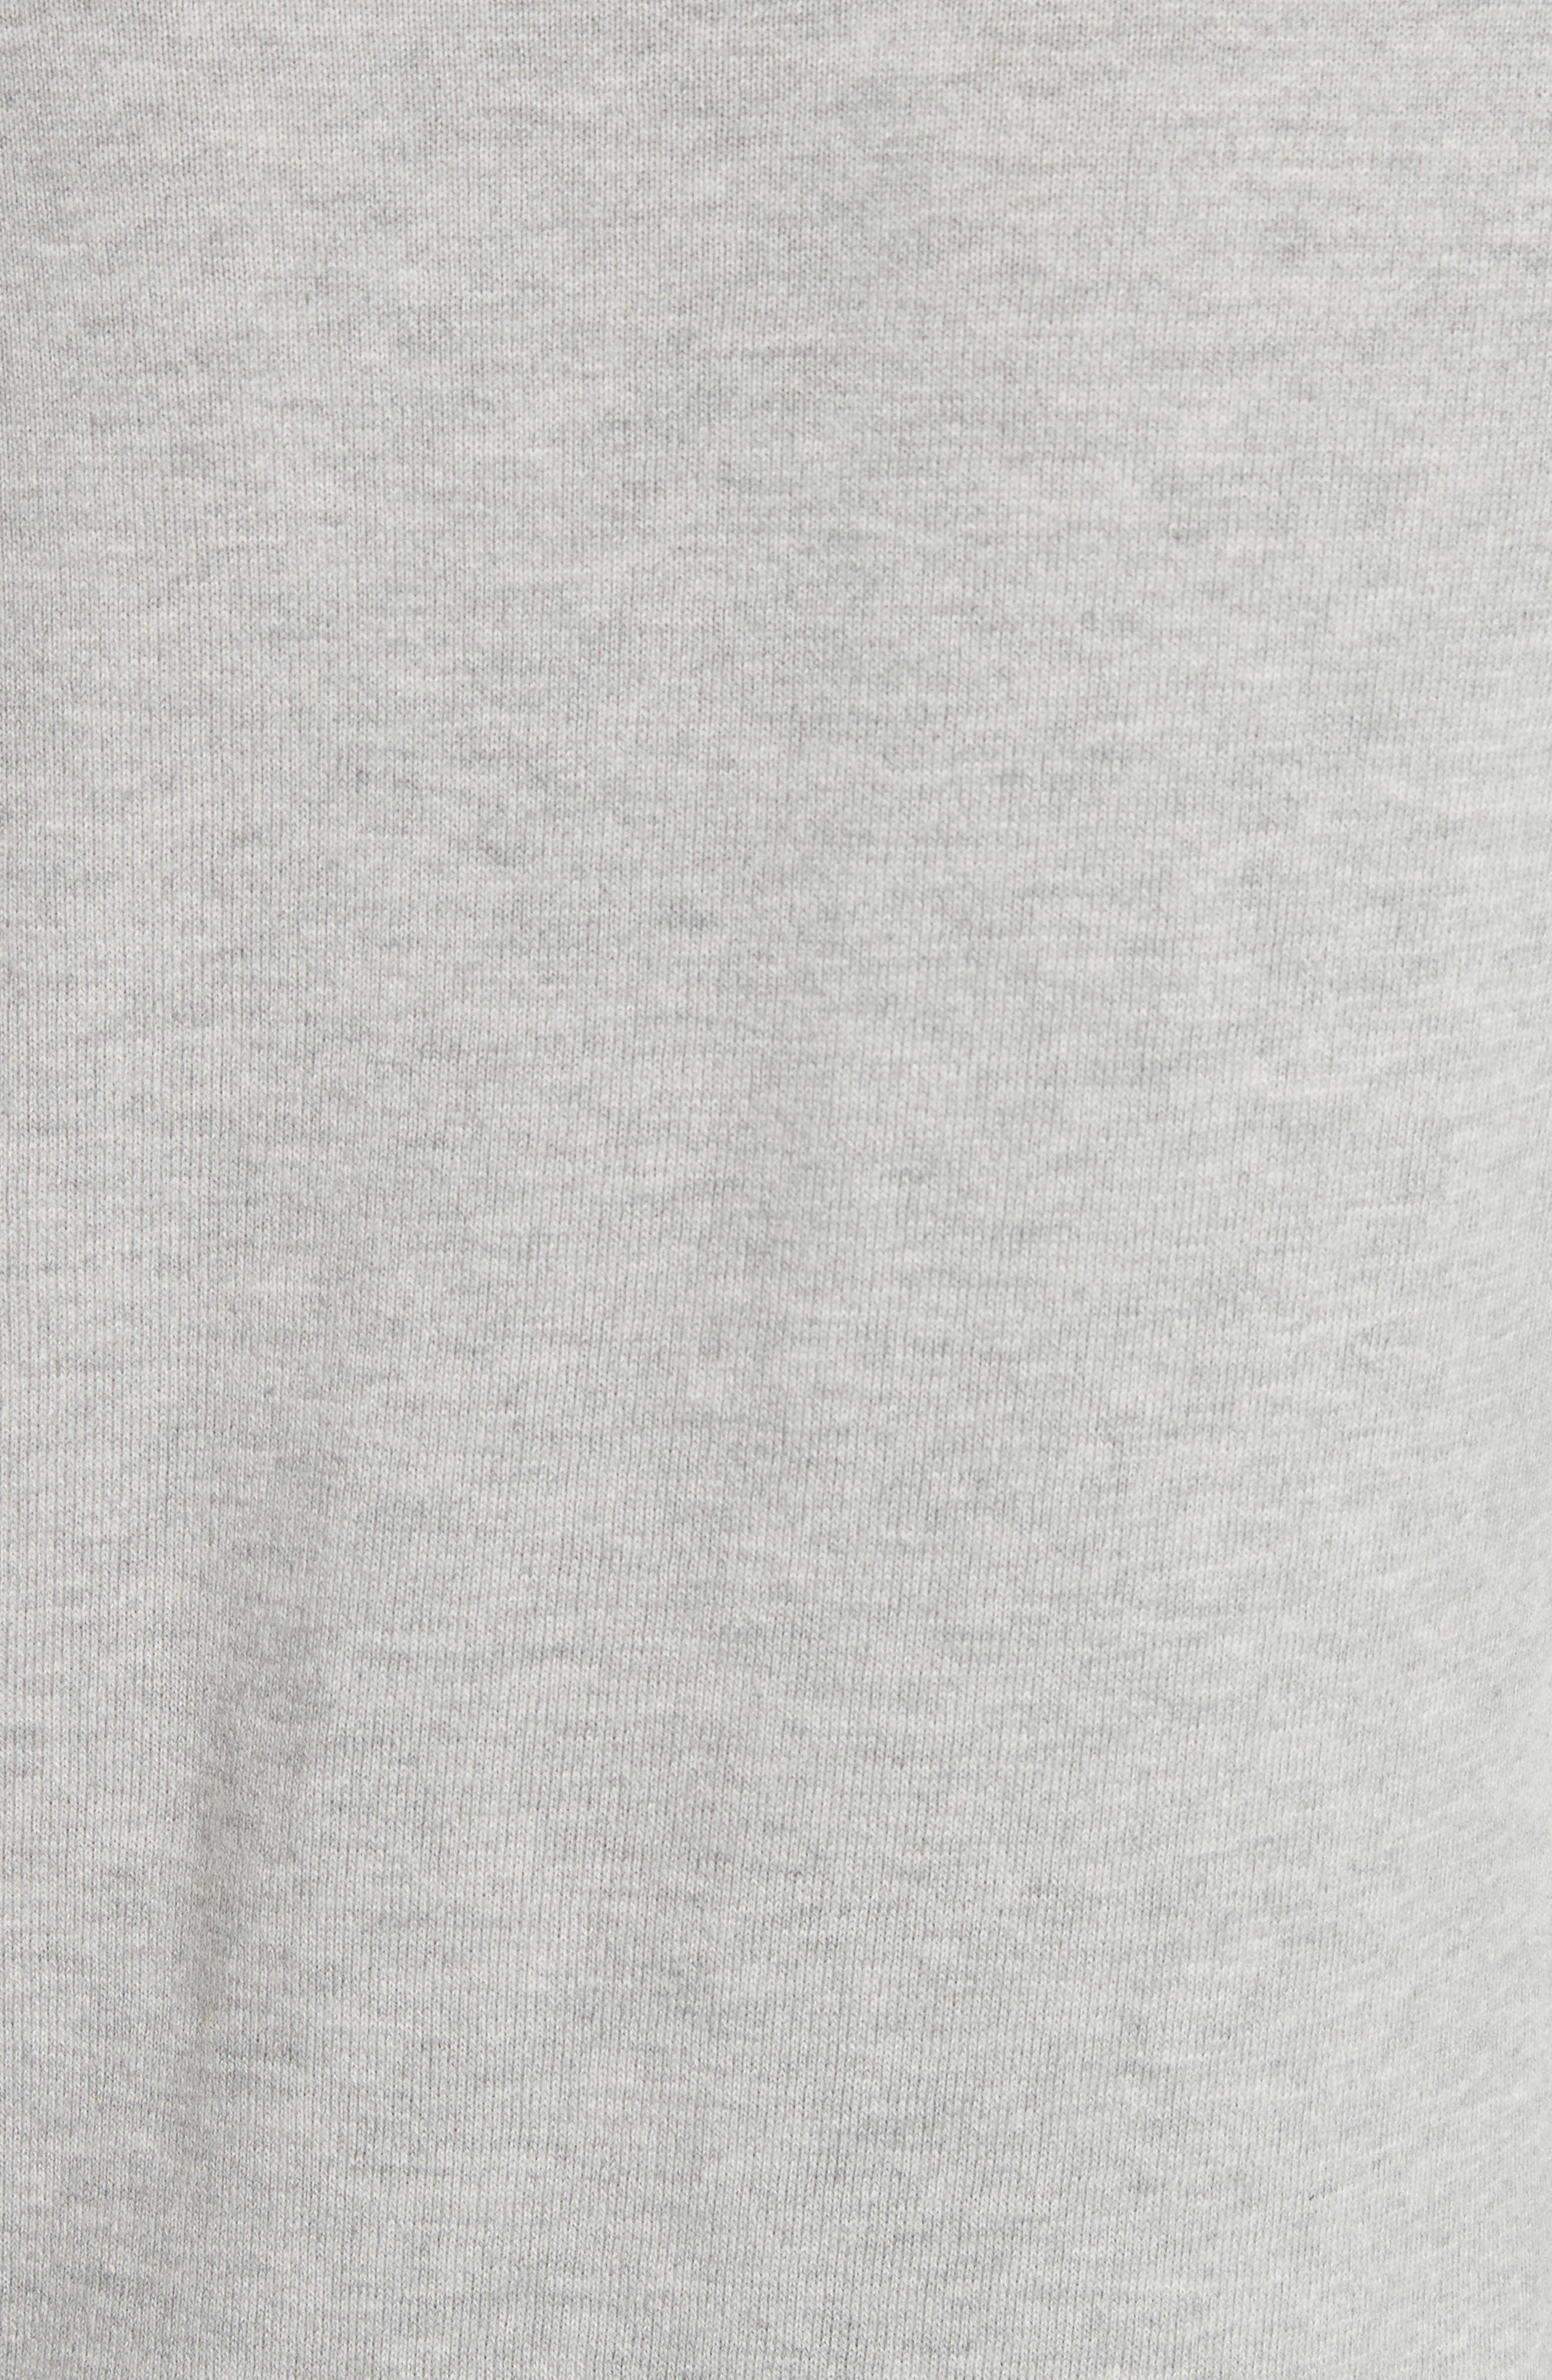 Cotton & Cashmere Sweater,                             Alternate thumbnail 5, color,                             Light Heather Grey